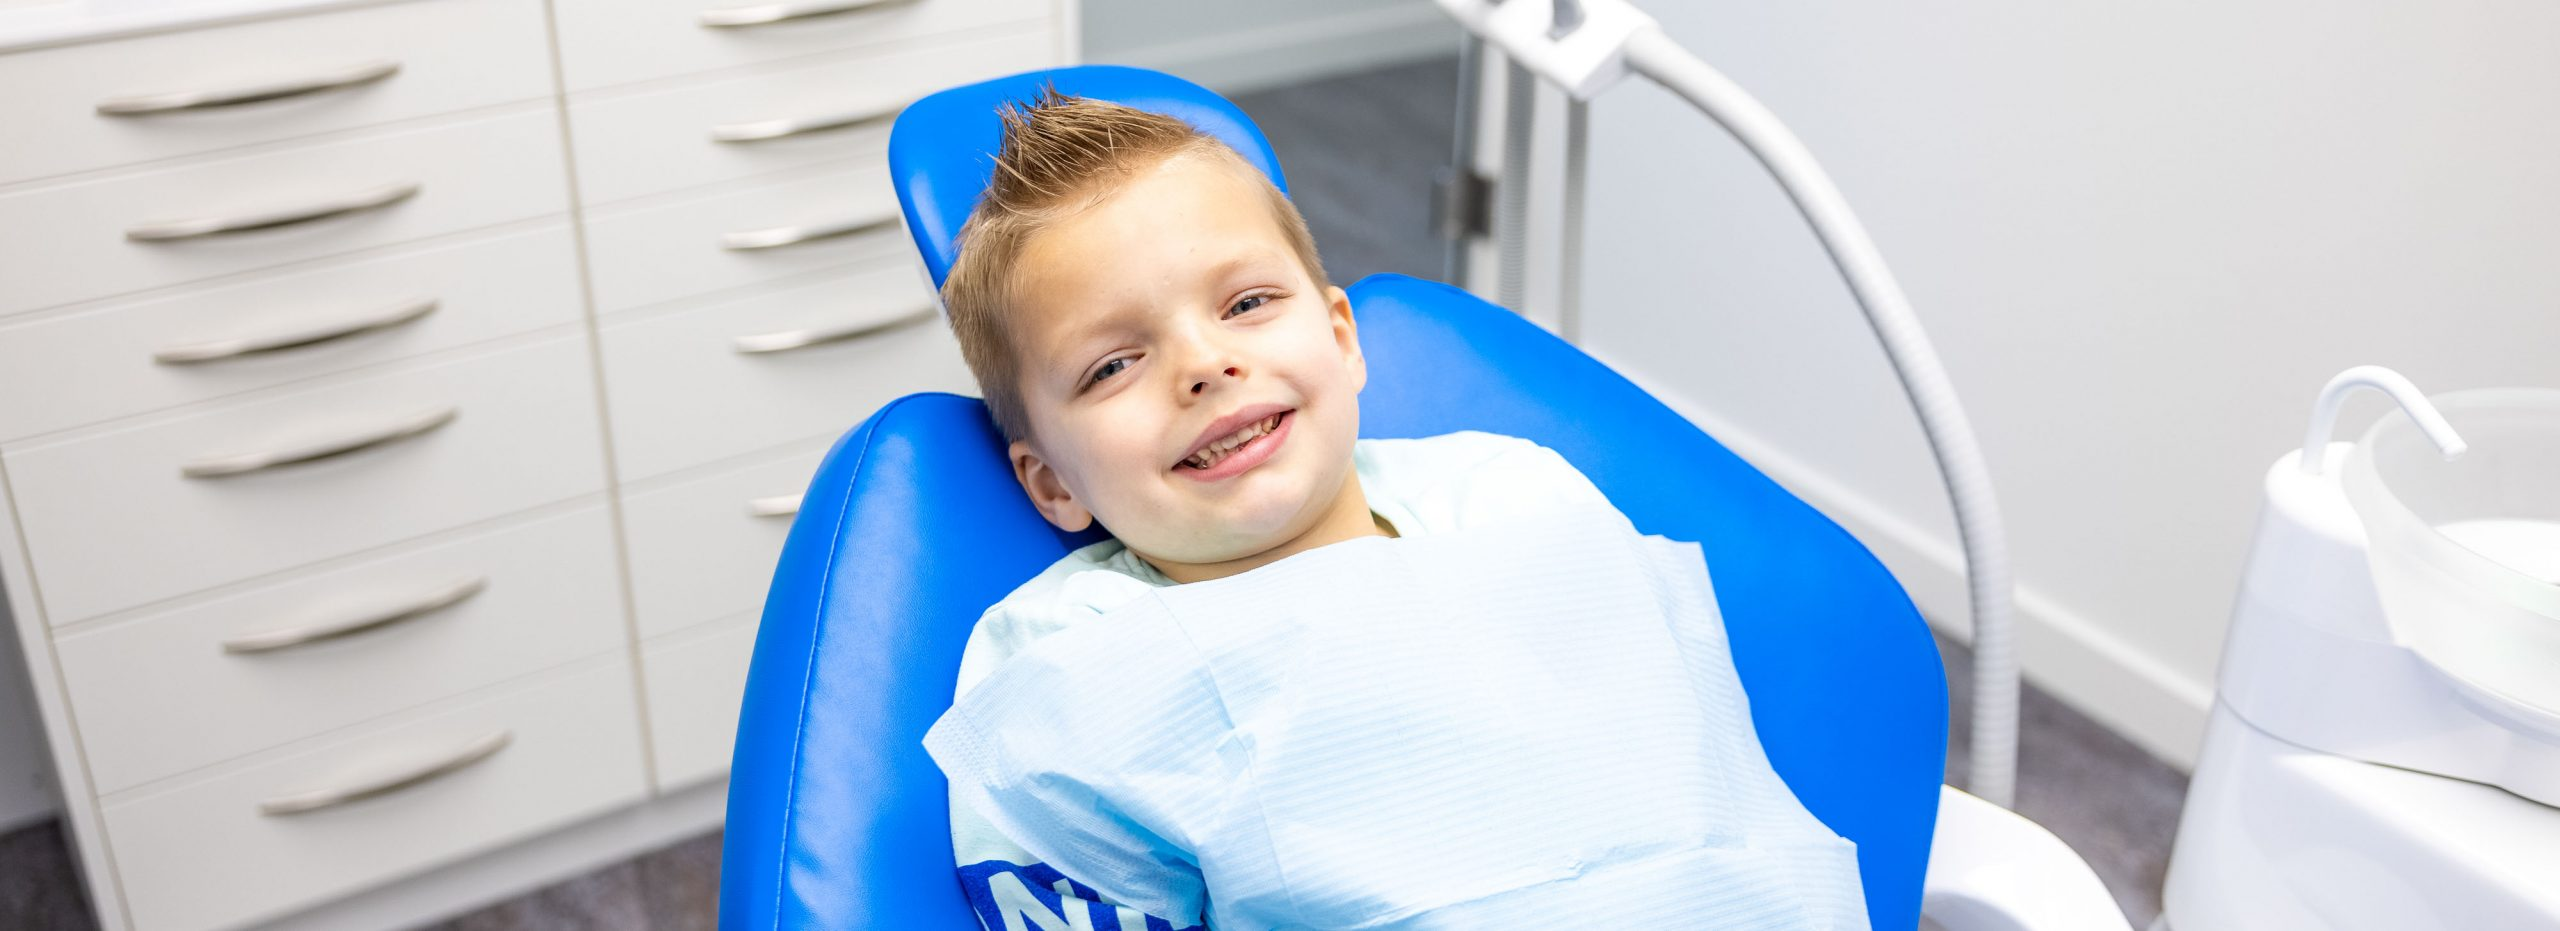 Tandartspraktijk hoflaan tandartsen 7 scaled